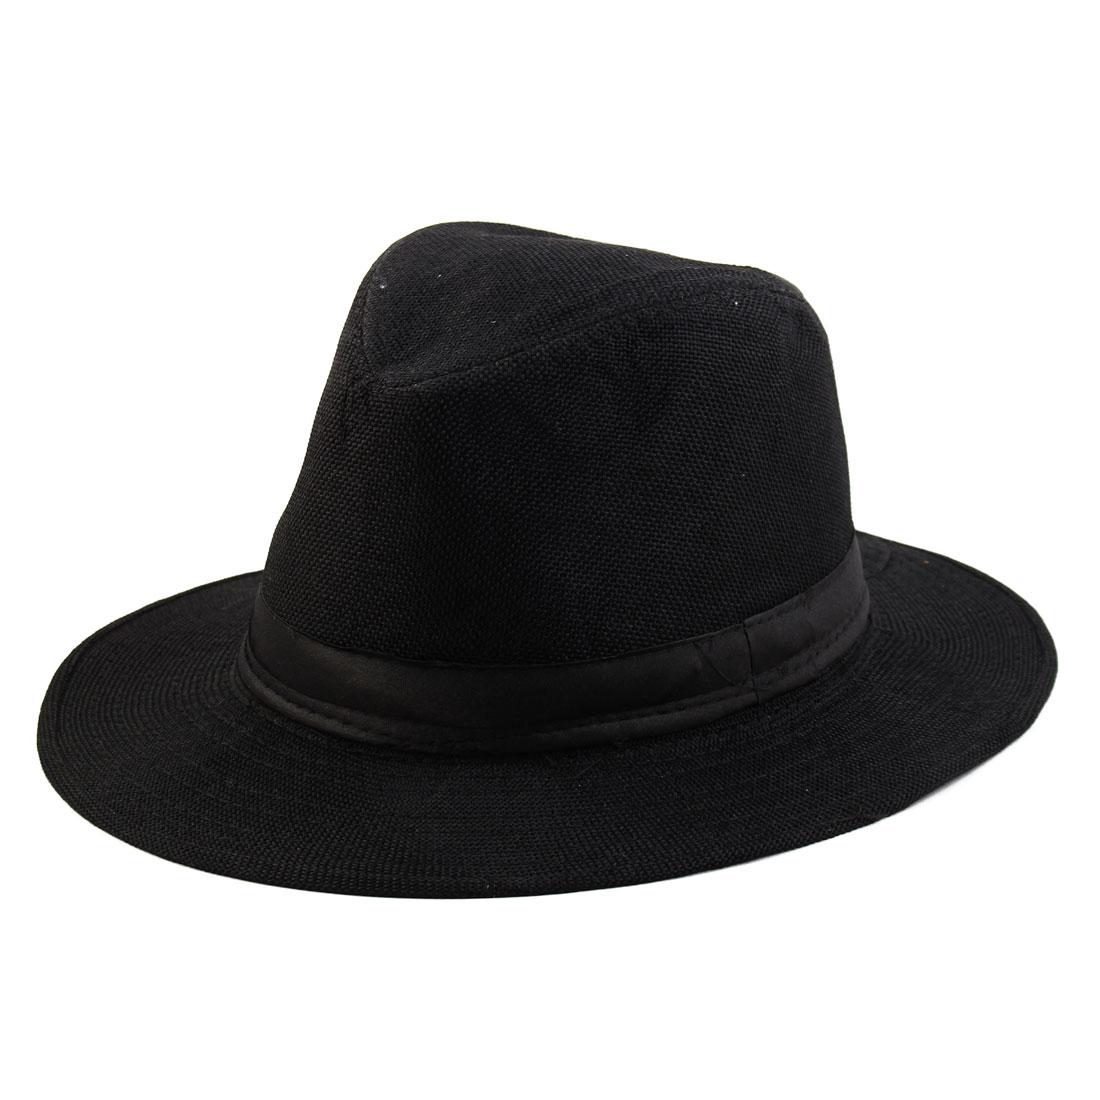 Summer Outdoor Linen Wide Brim Western Style Beach Sunhat Cowboy Hat Black